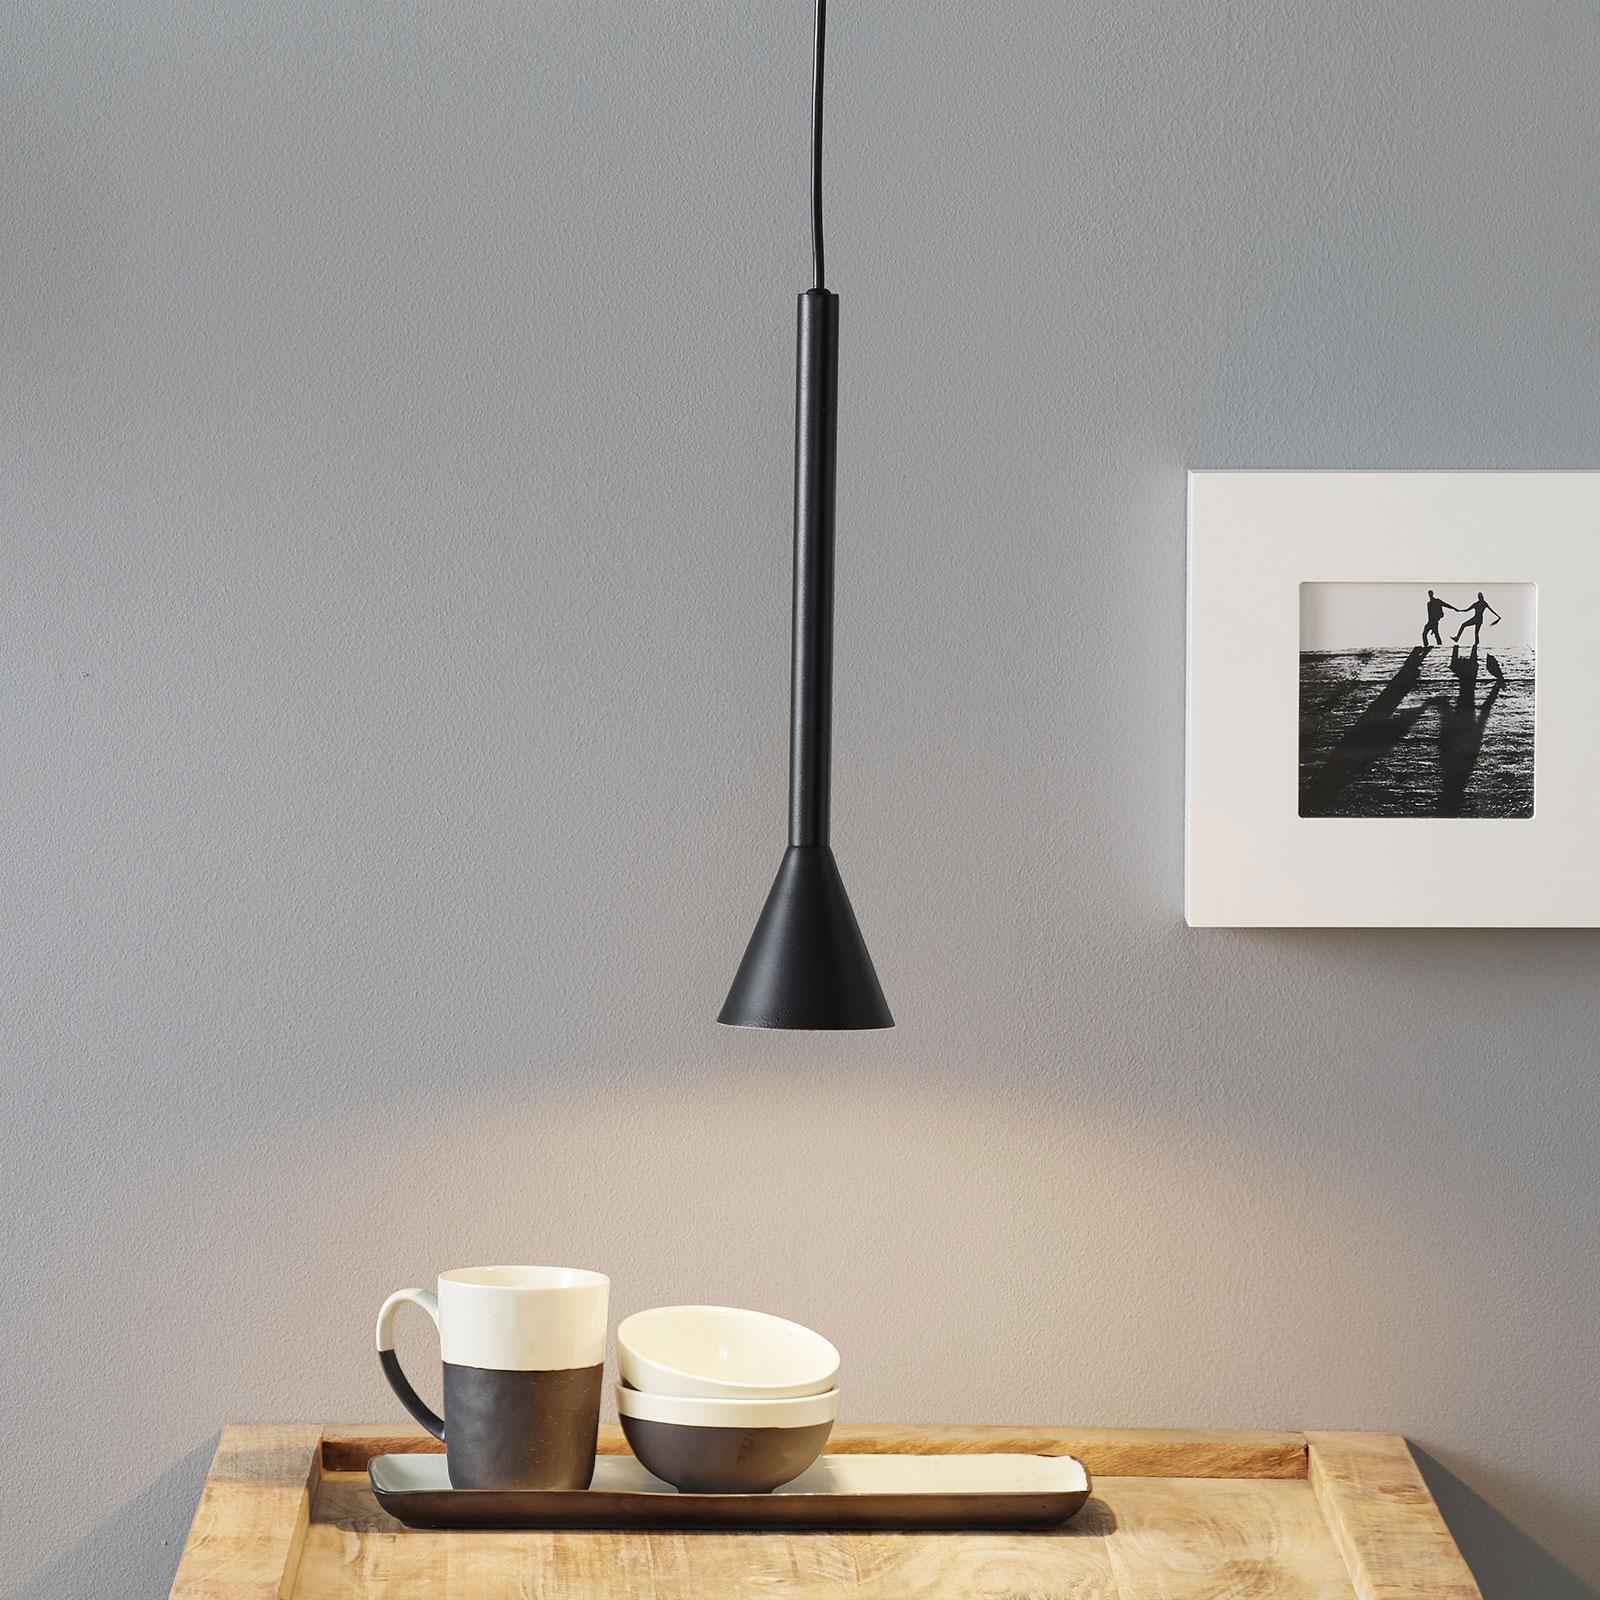 Lucande Caris hanglamp Ø8,5cm zwart/wit